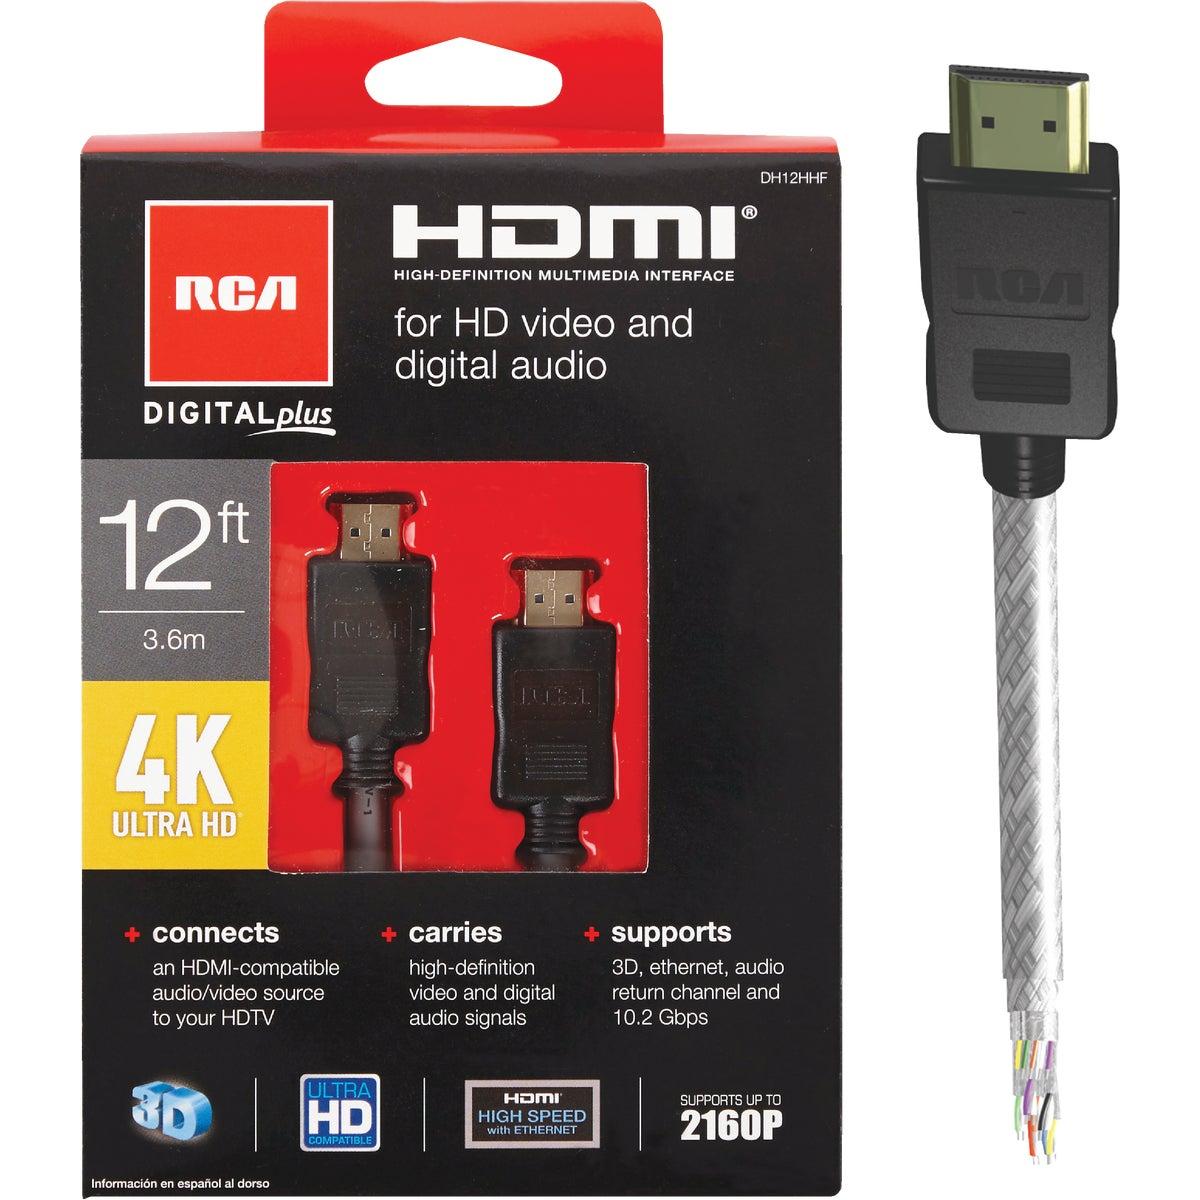 Audiovox Accessories 12' DIGITAL HDMI CABLE DH12HH